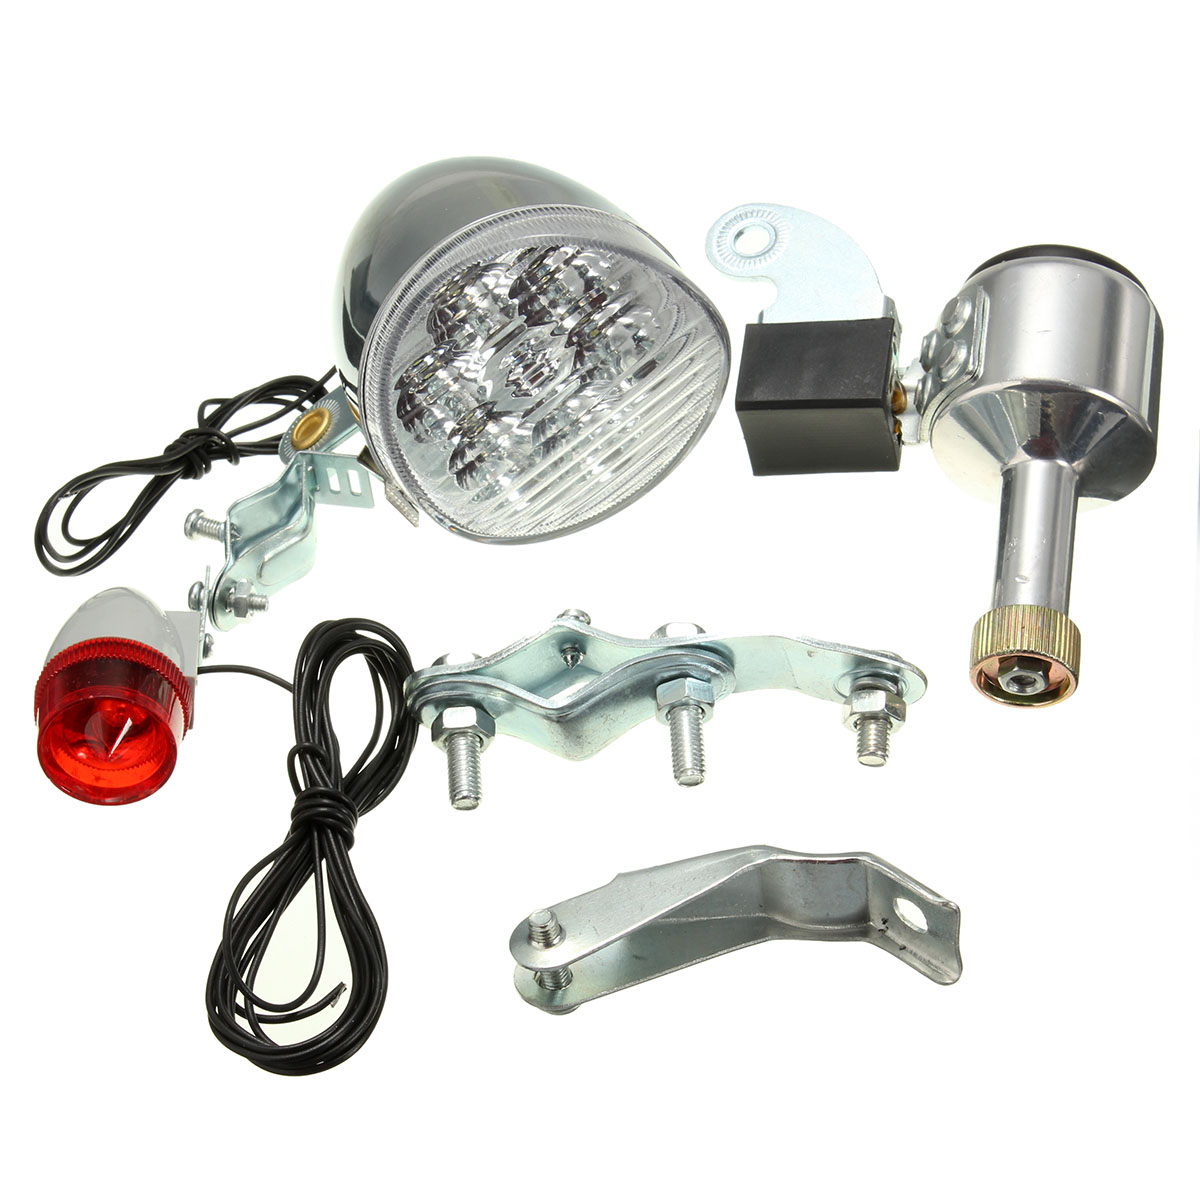 Motorized Friction Generator Dynamo Led Head Light Tail Lamp 3w 6v